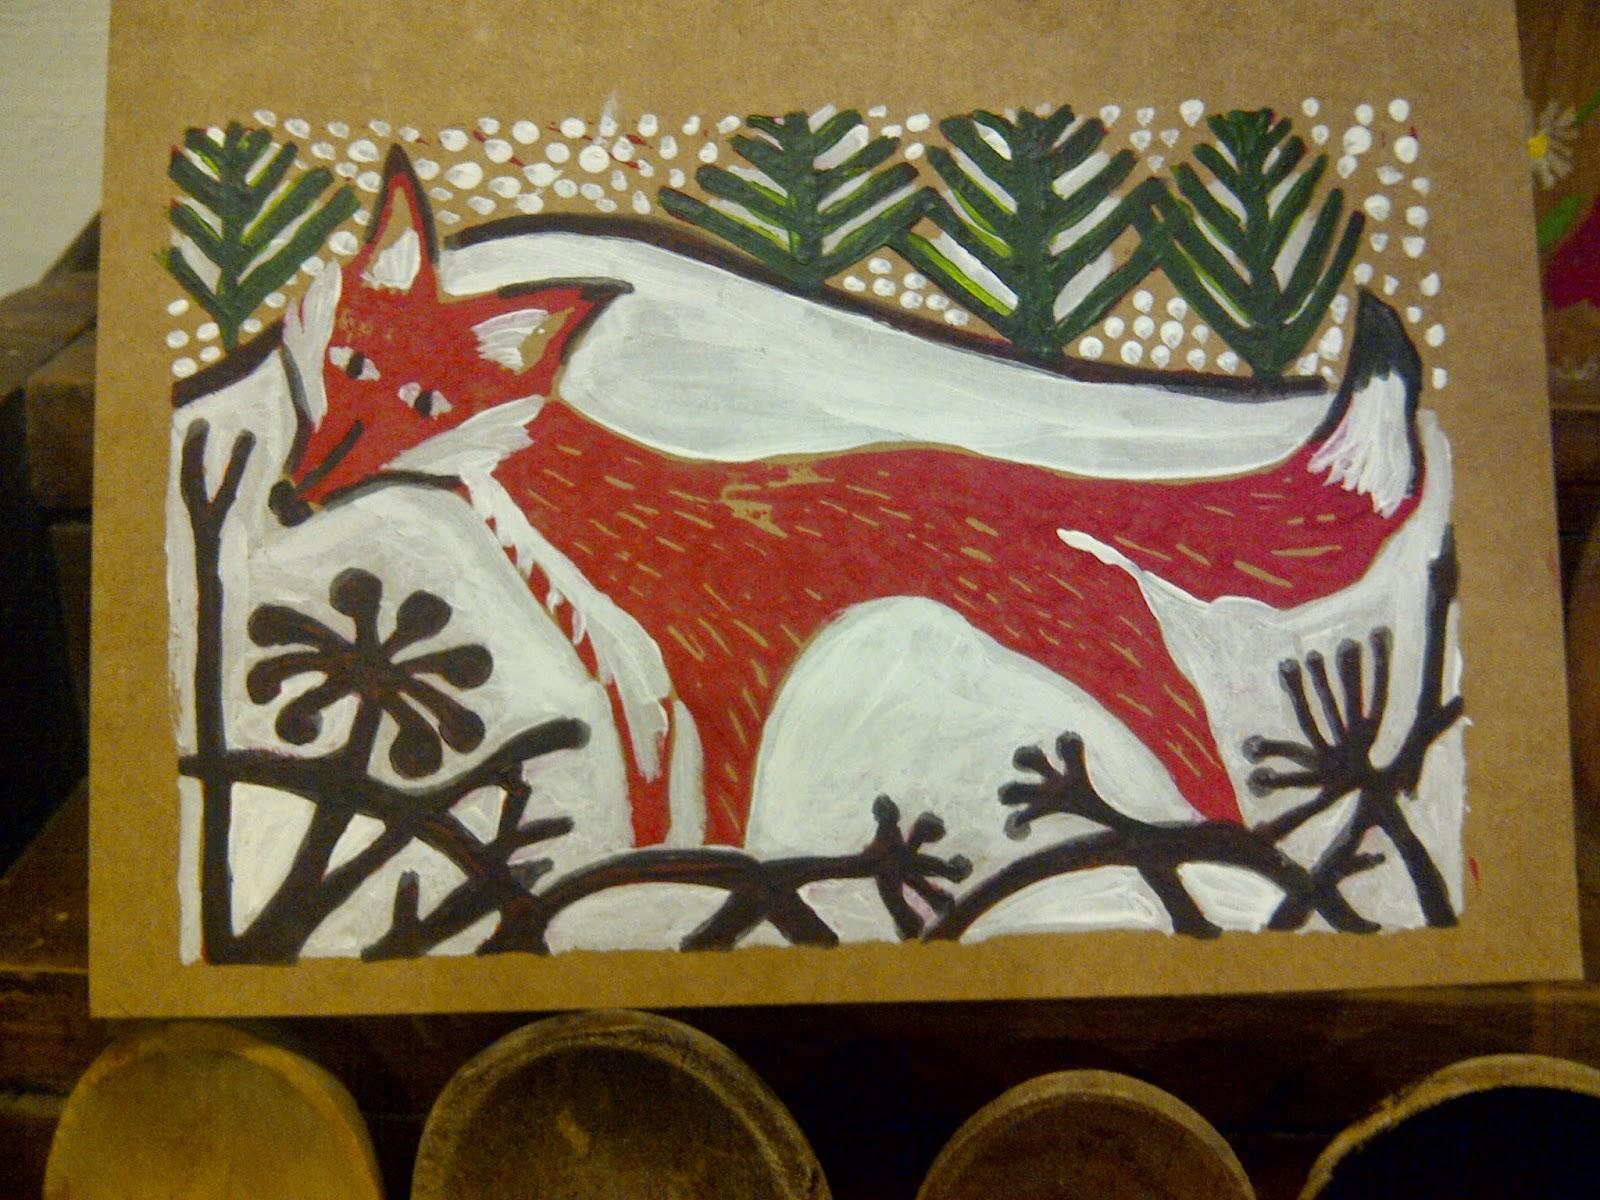 tinchapel textiles my lino cut christmas card